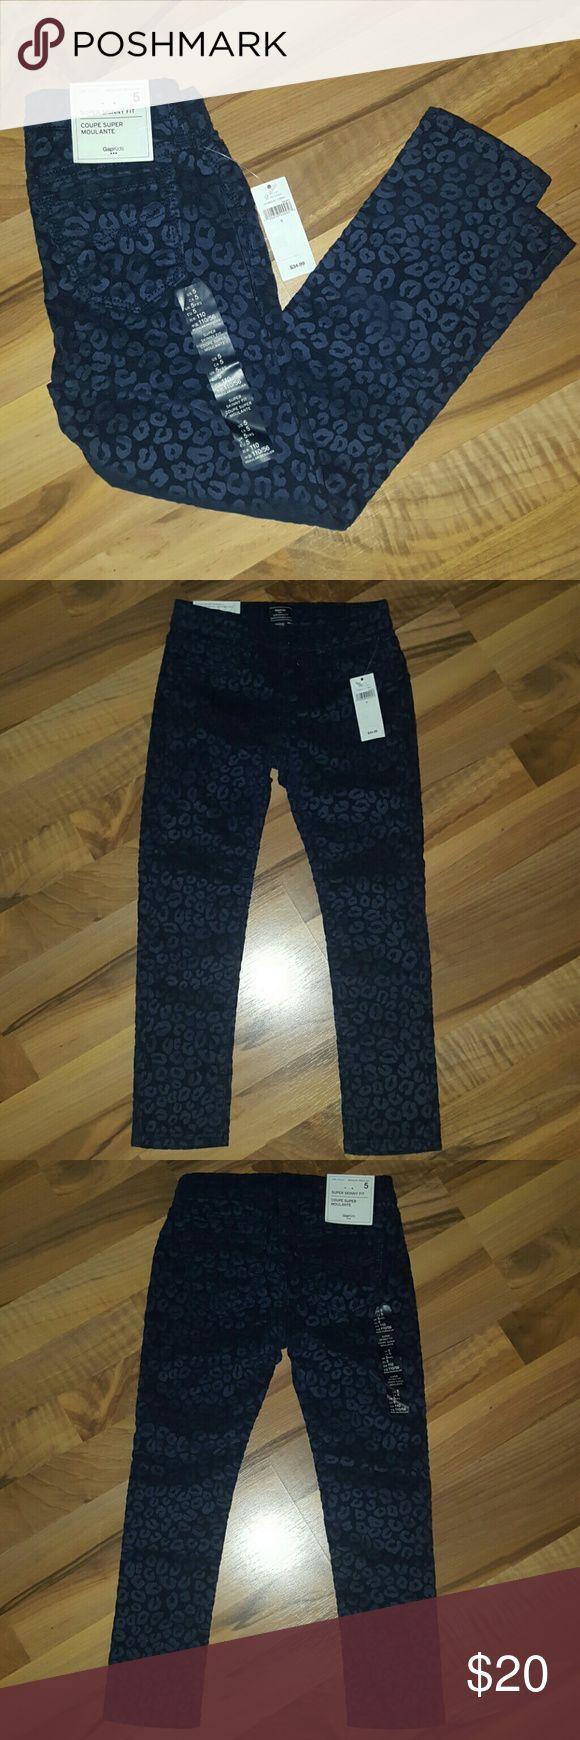 Girls Gap Super Skinny Fit Jeans Blue Leopard print, soft suede-feel, adjustable waist, super skinny fit size 5 regular. Brand New with tags. GAP Bottoms Jeans